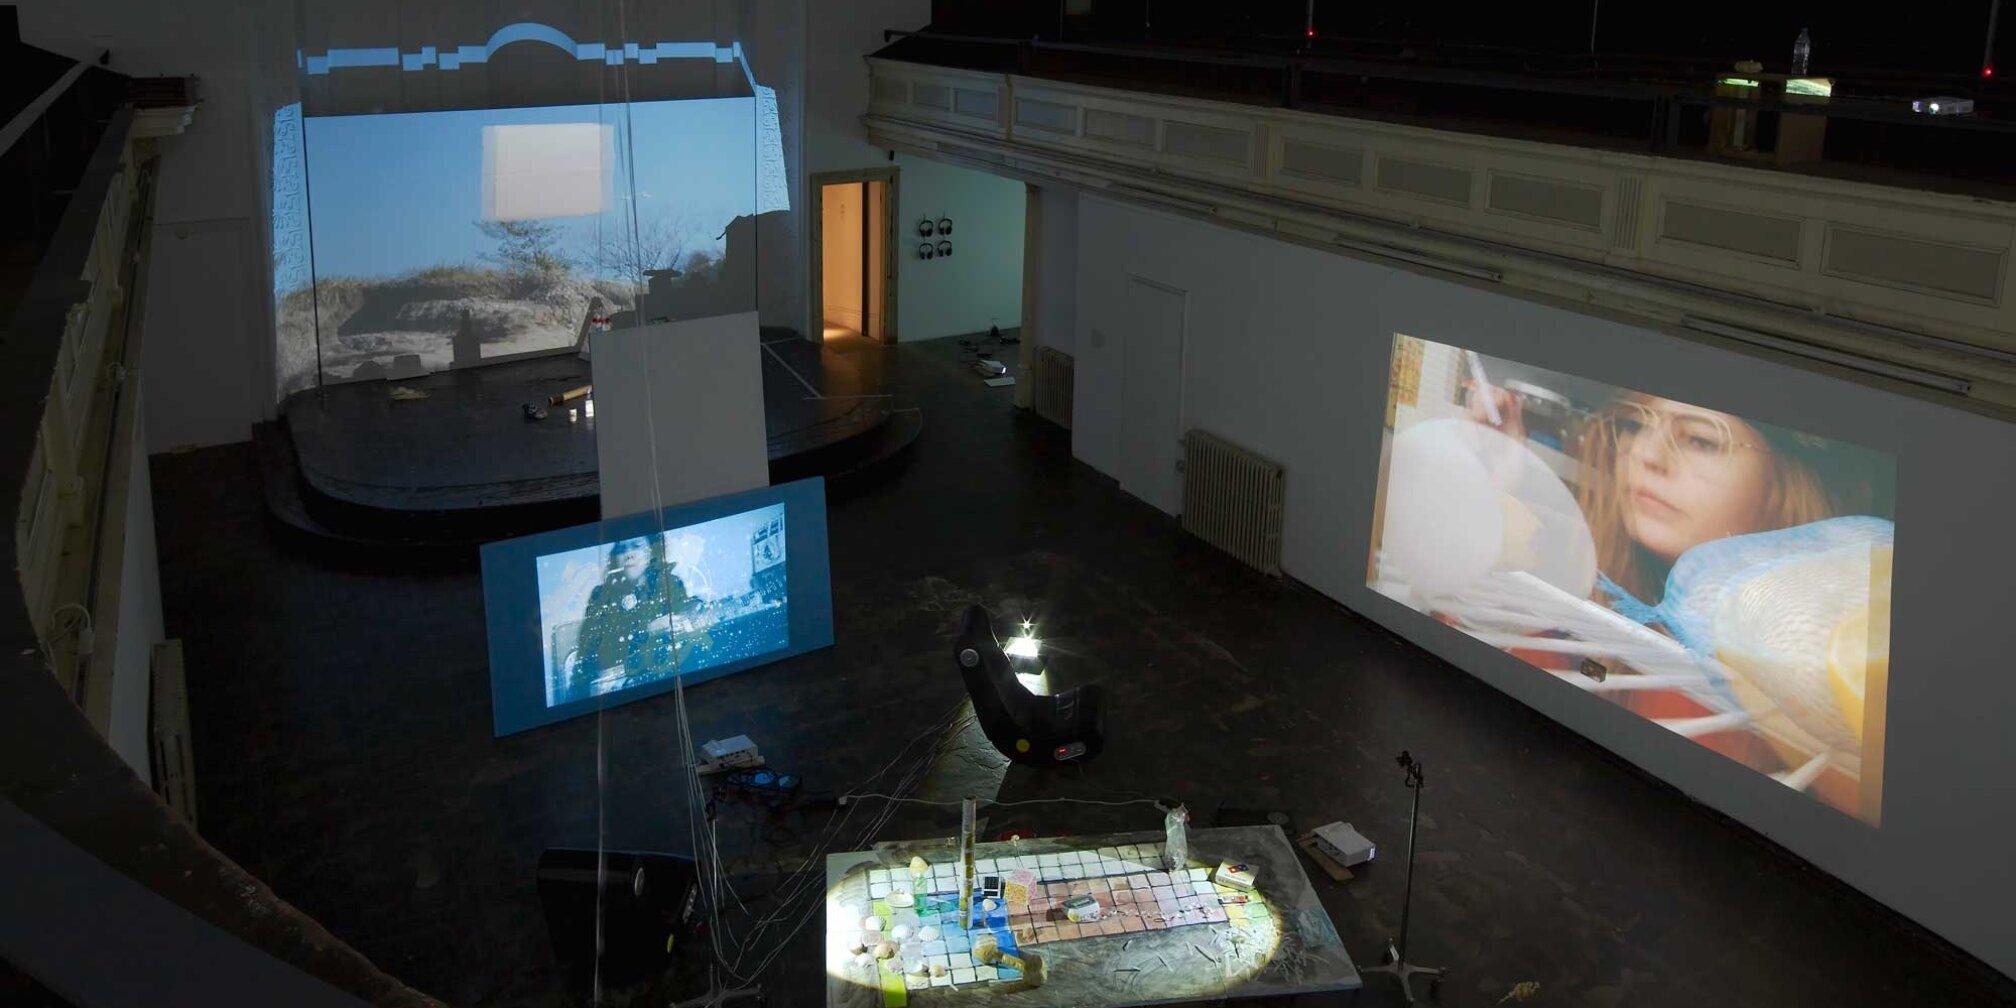 Installation view, Trisha Baga, 2014 Zabludowicz Collection, London . Photo: Andy Keate.